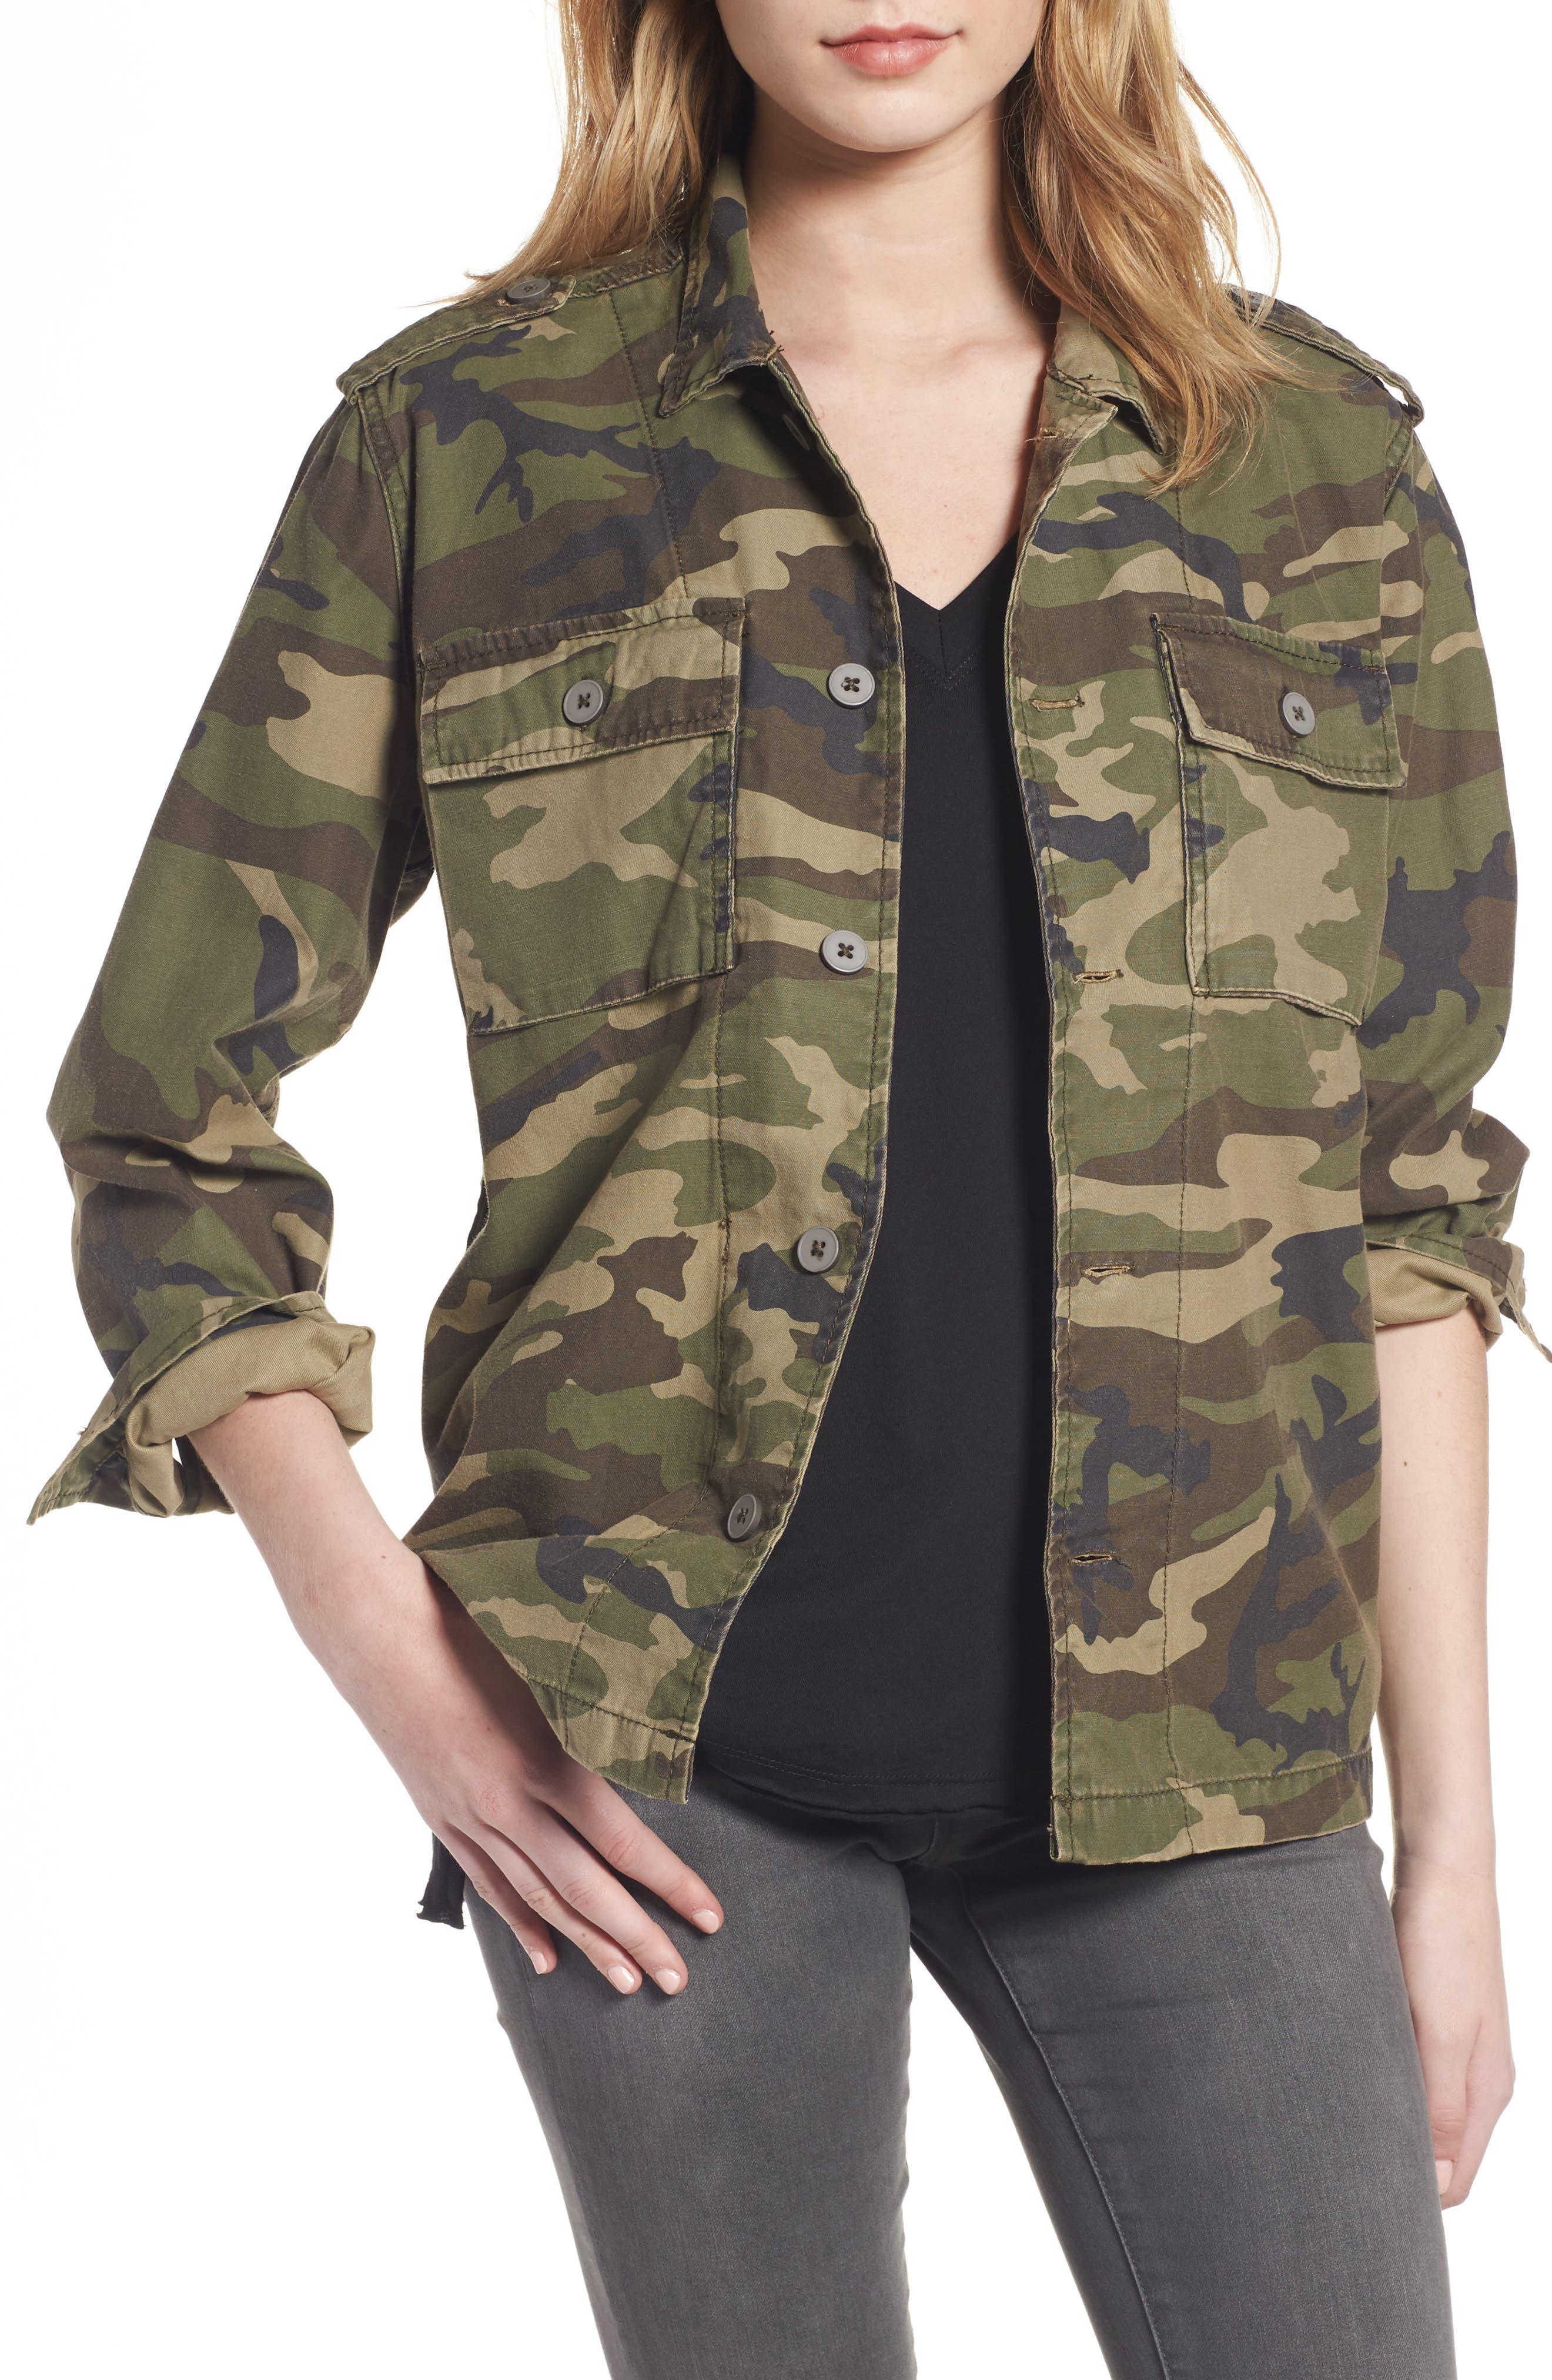 Alternate Image 1 Selected - Thread & Supply Barton Camo Print Jacket